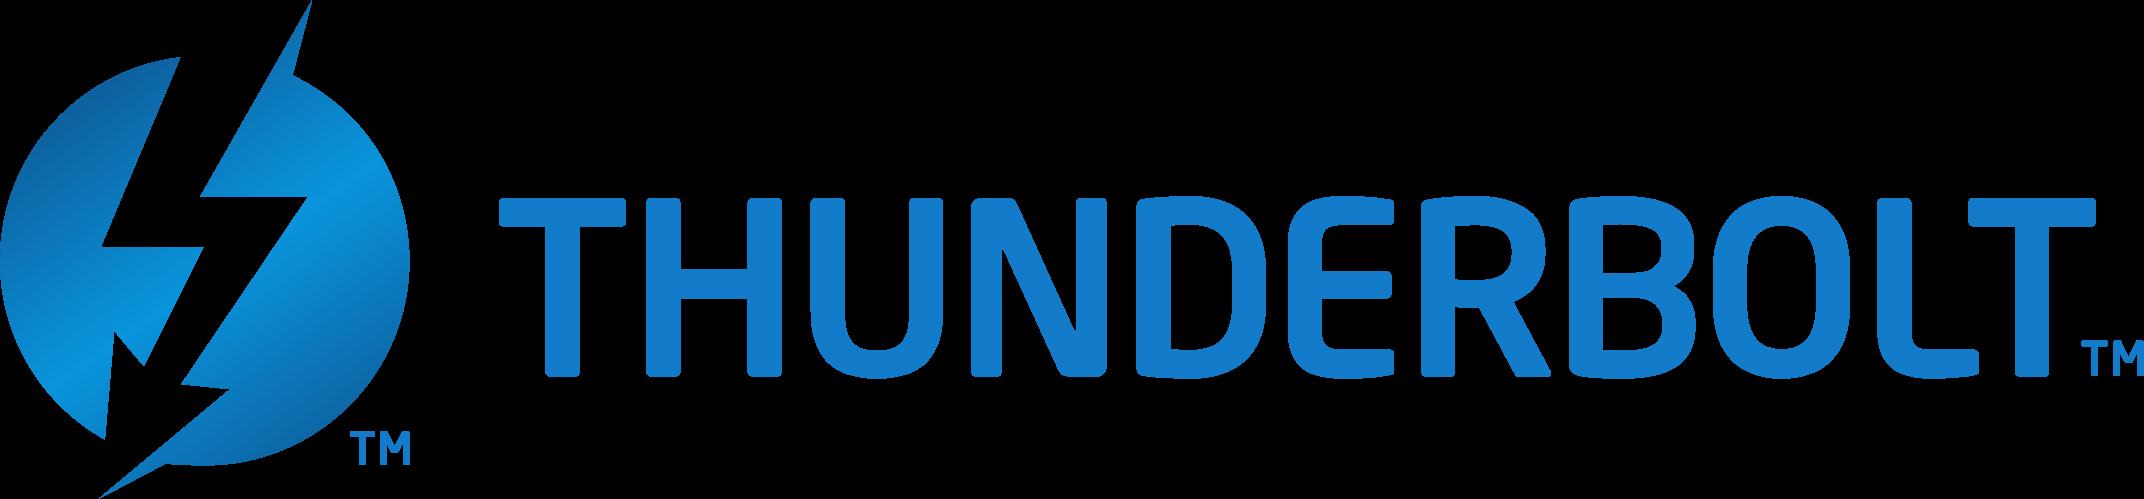 Transparent Thunderbolt Logo with Name